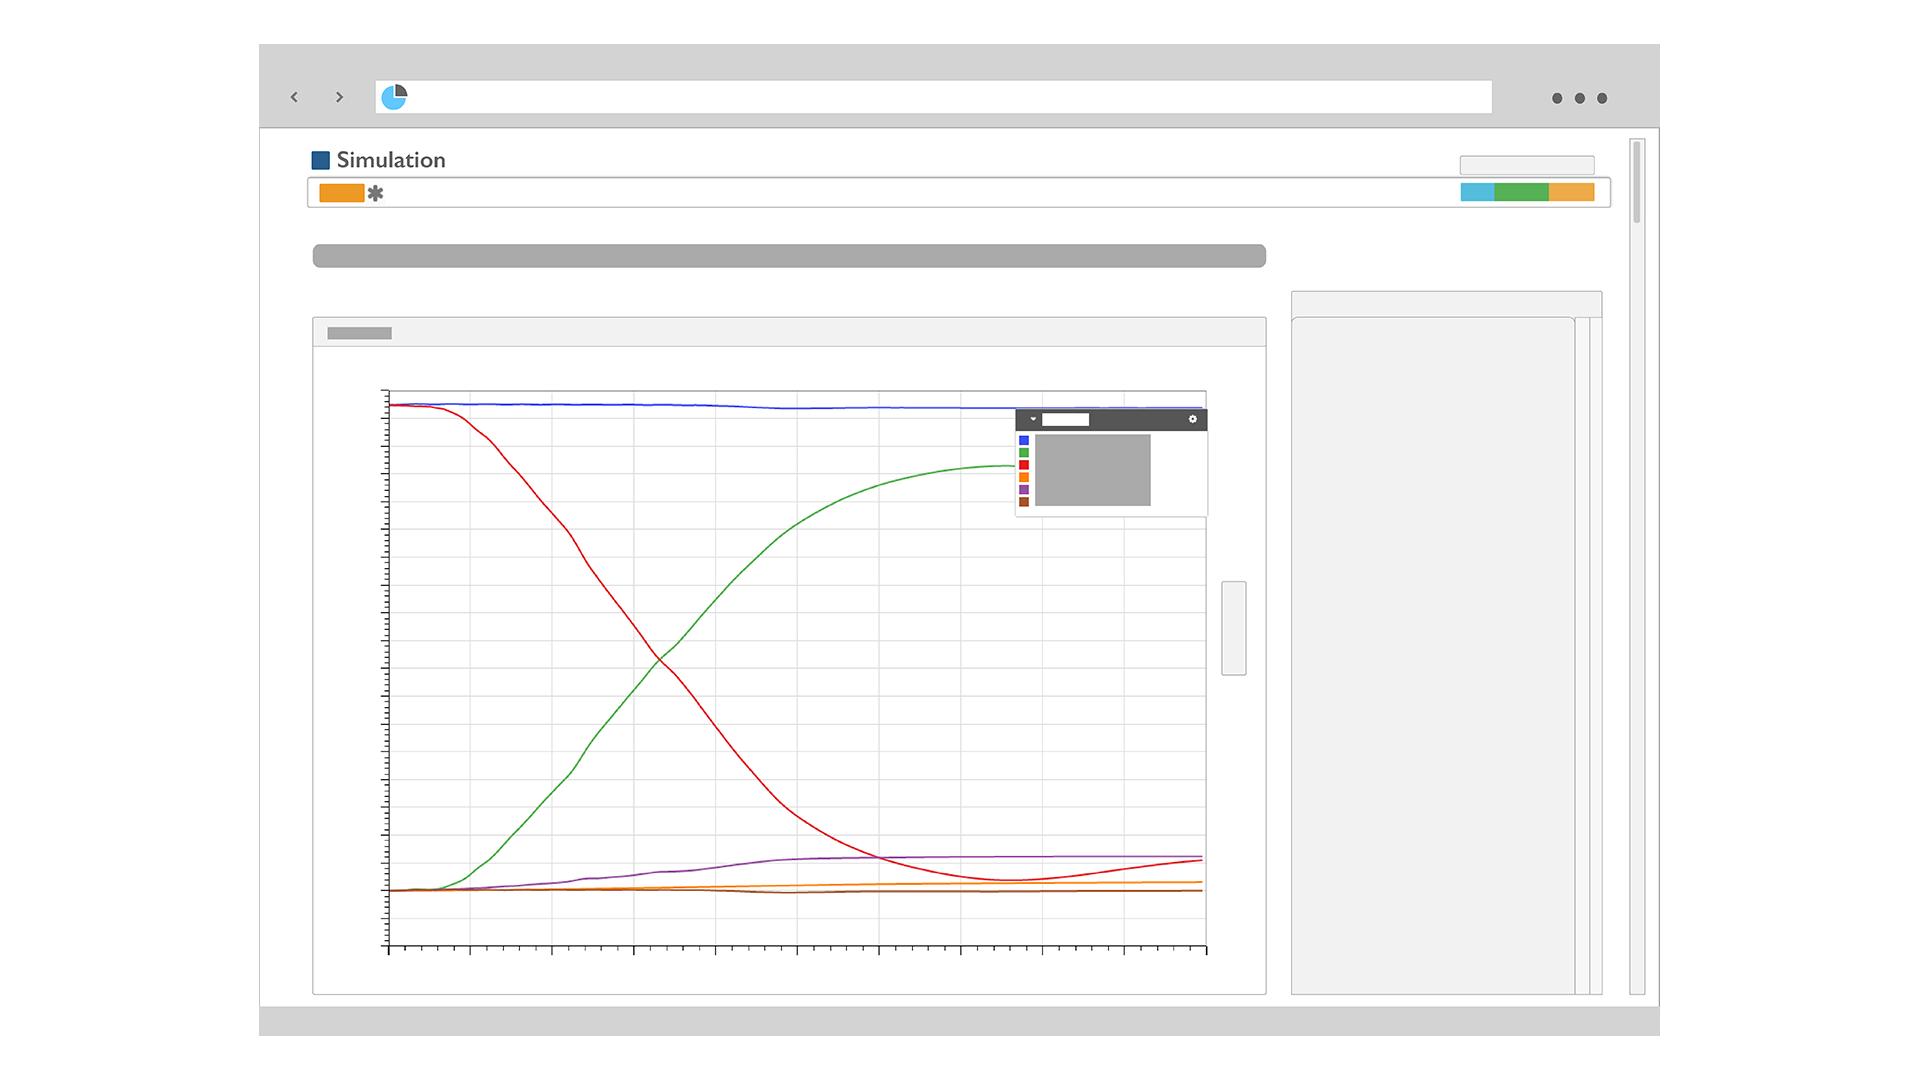 Simulation Results KPIs